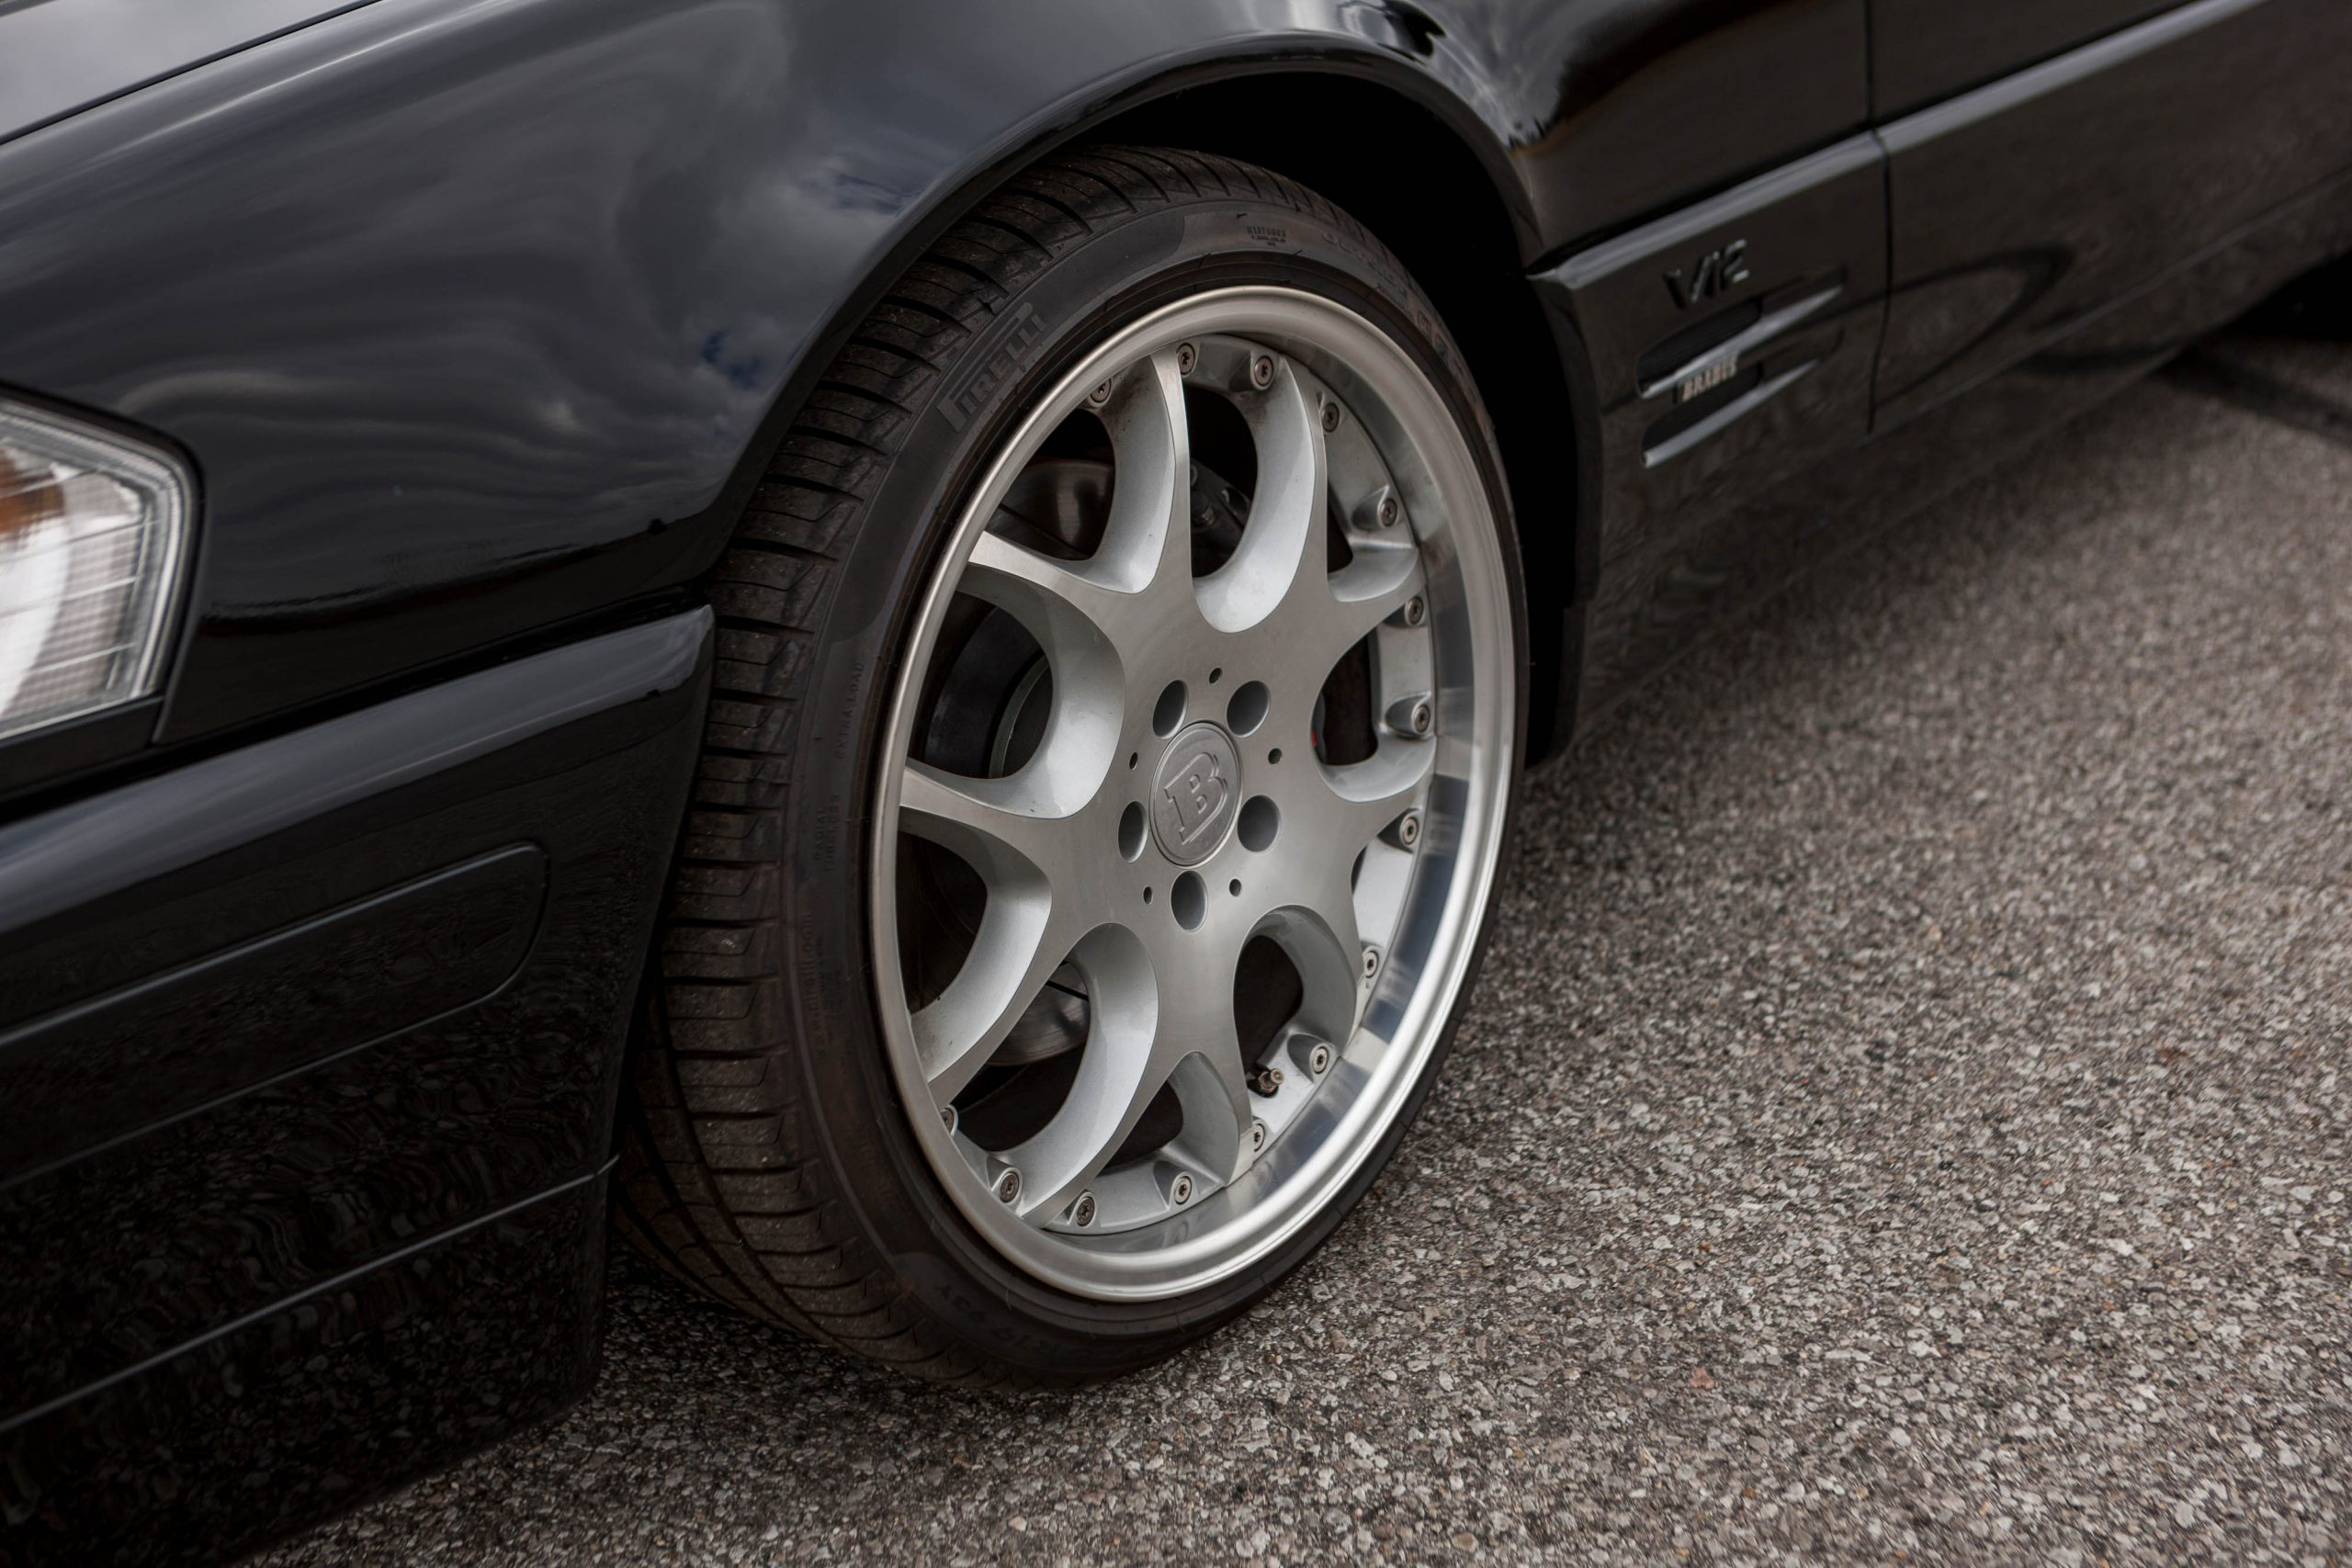 1999 Mercedes-Benz Brabus 7.3 S wheel